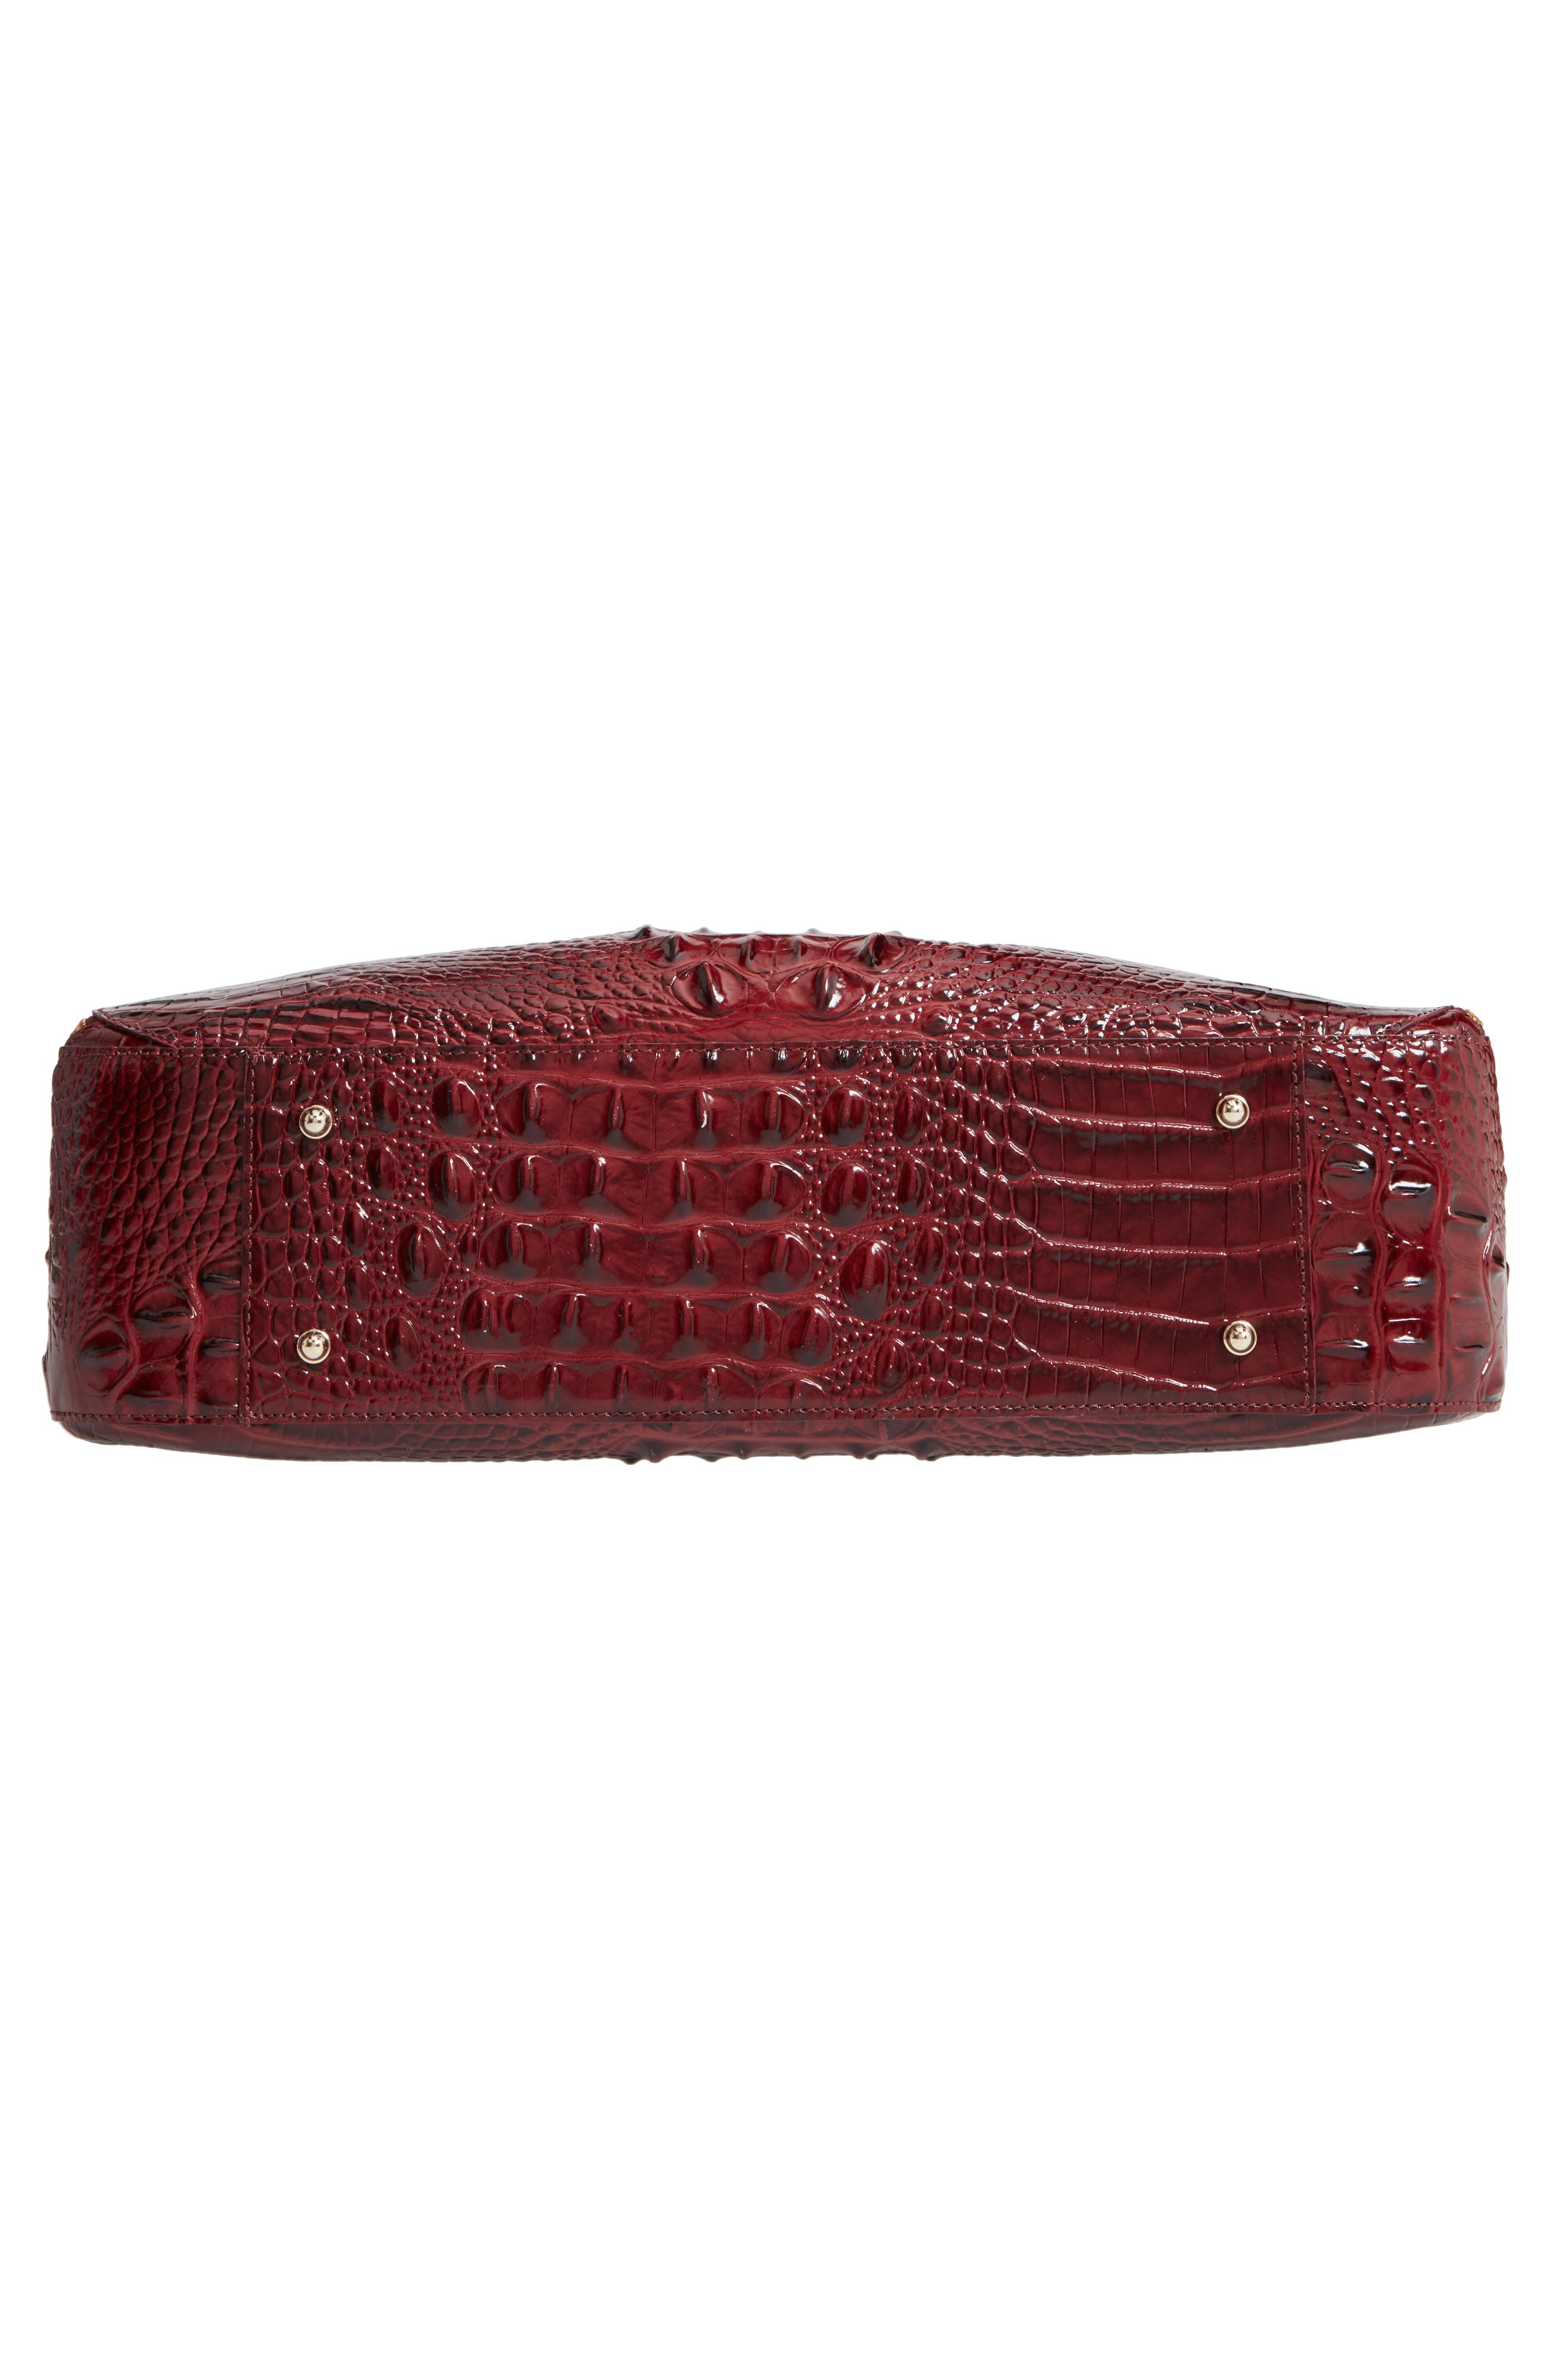 Melbourne - Adina Croc Embossed Leather Satchel,                             Alternate thumbnail 6, color,                             Tart